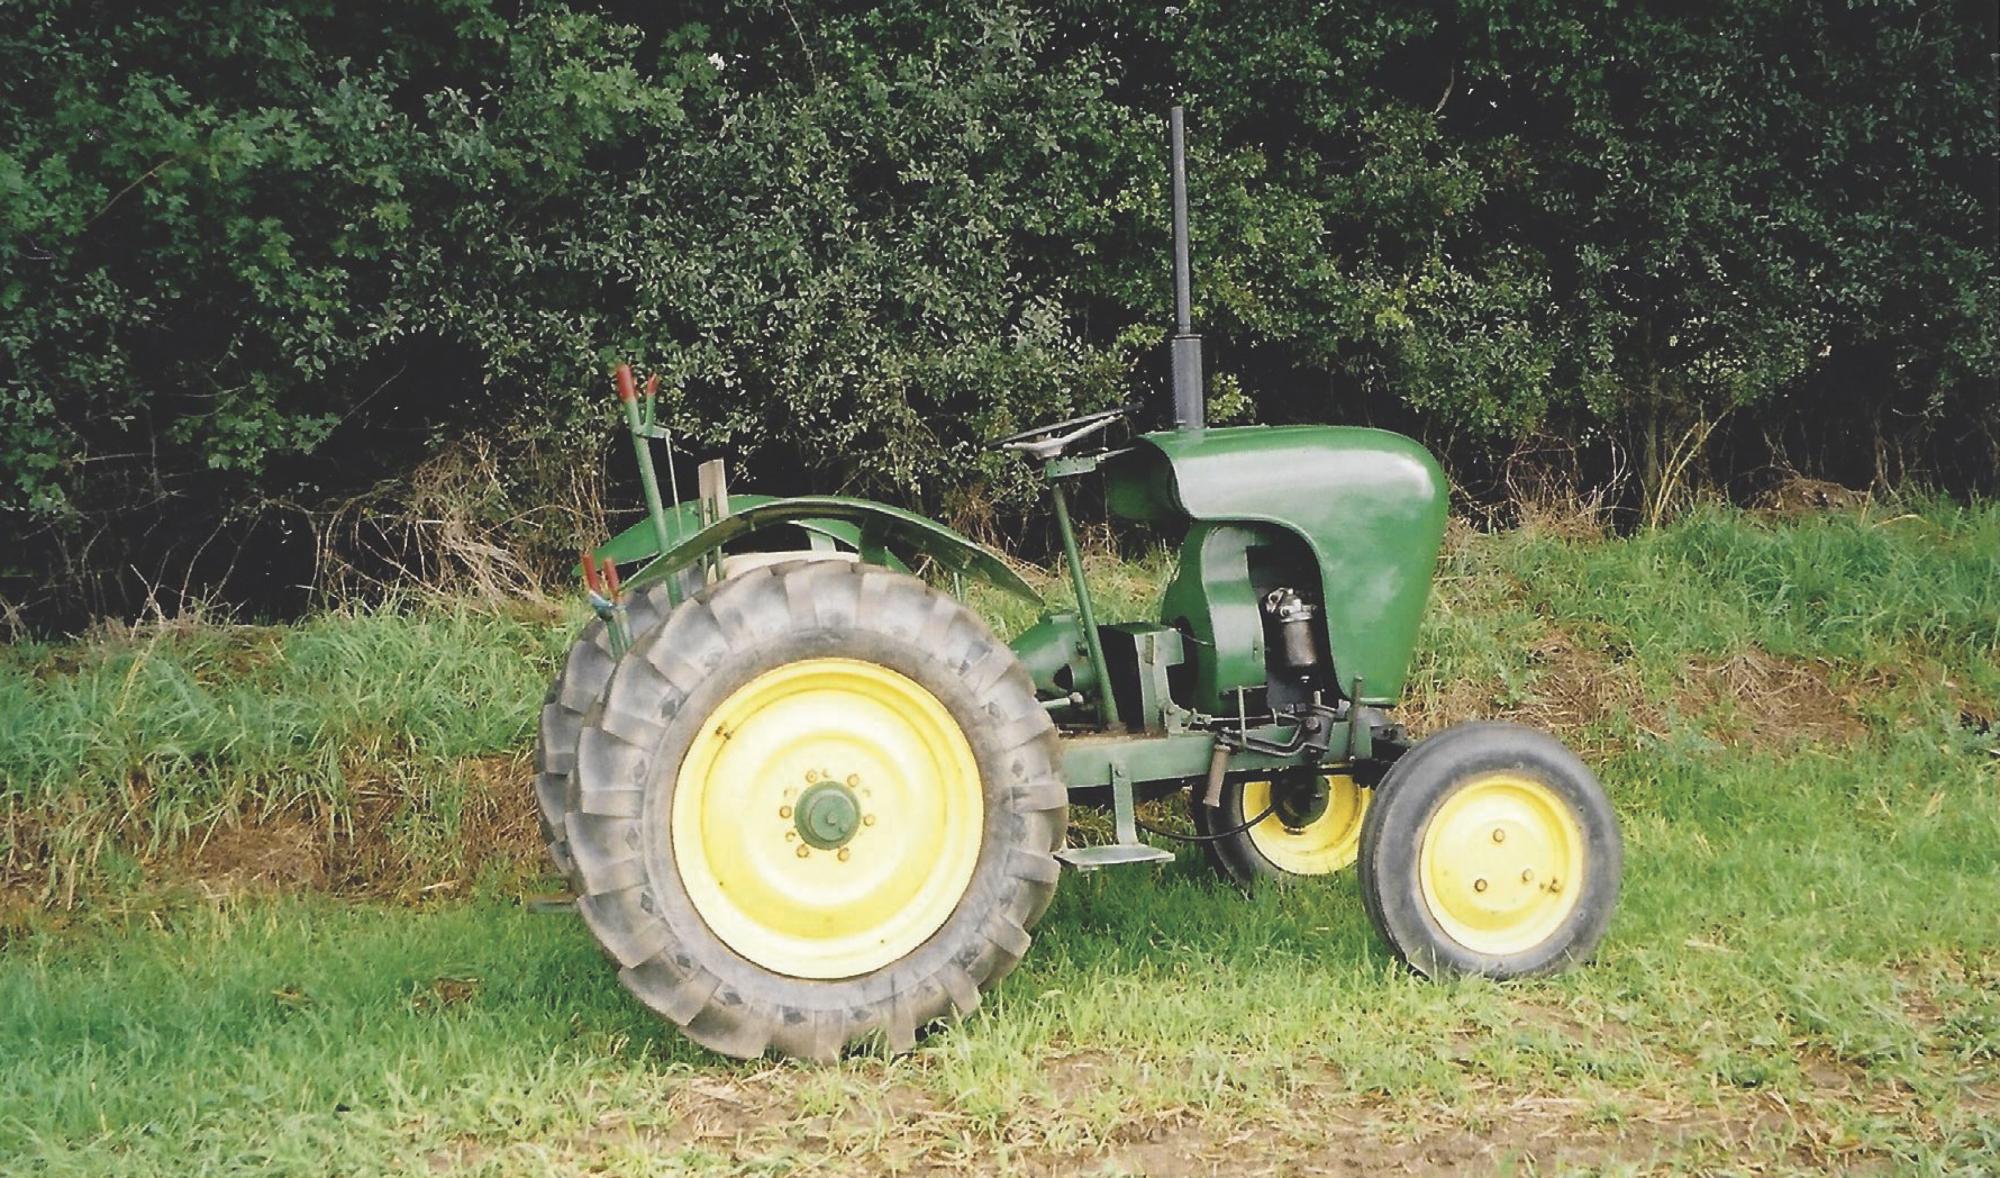 The Crawley 75 tractor